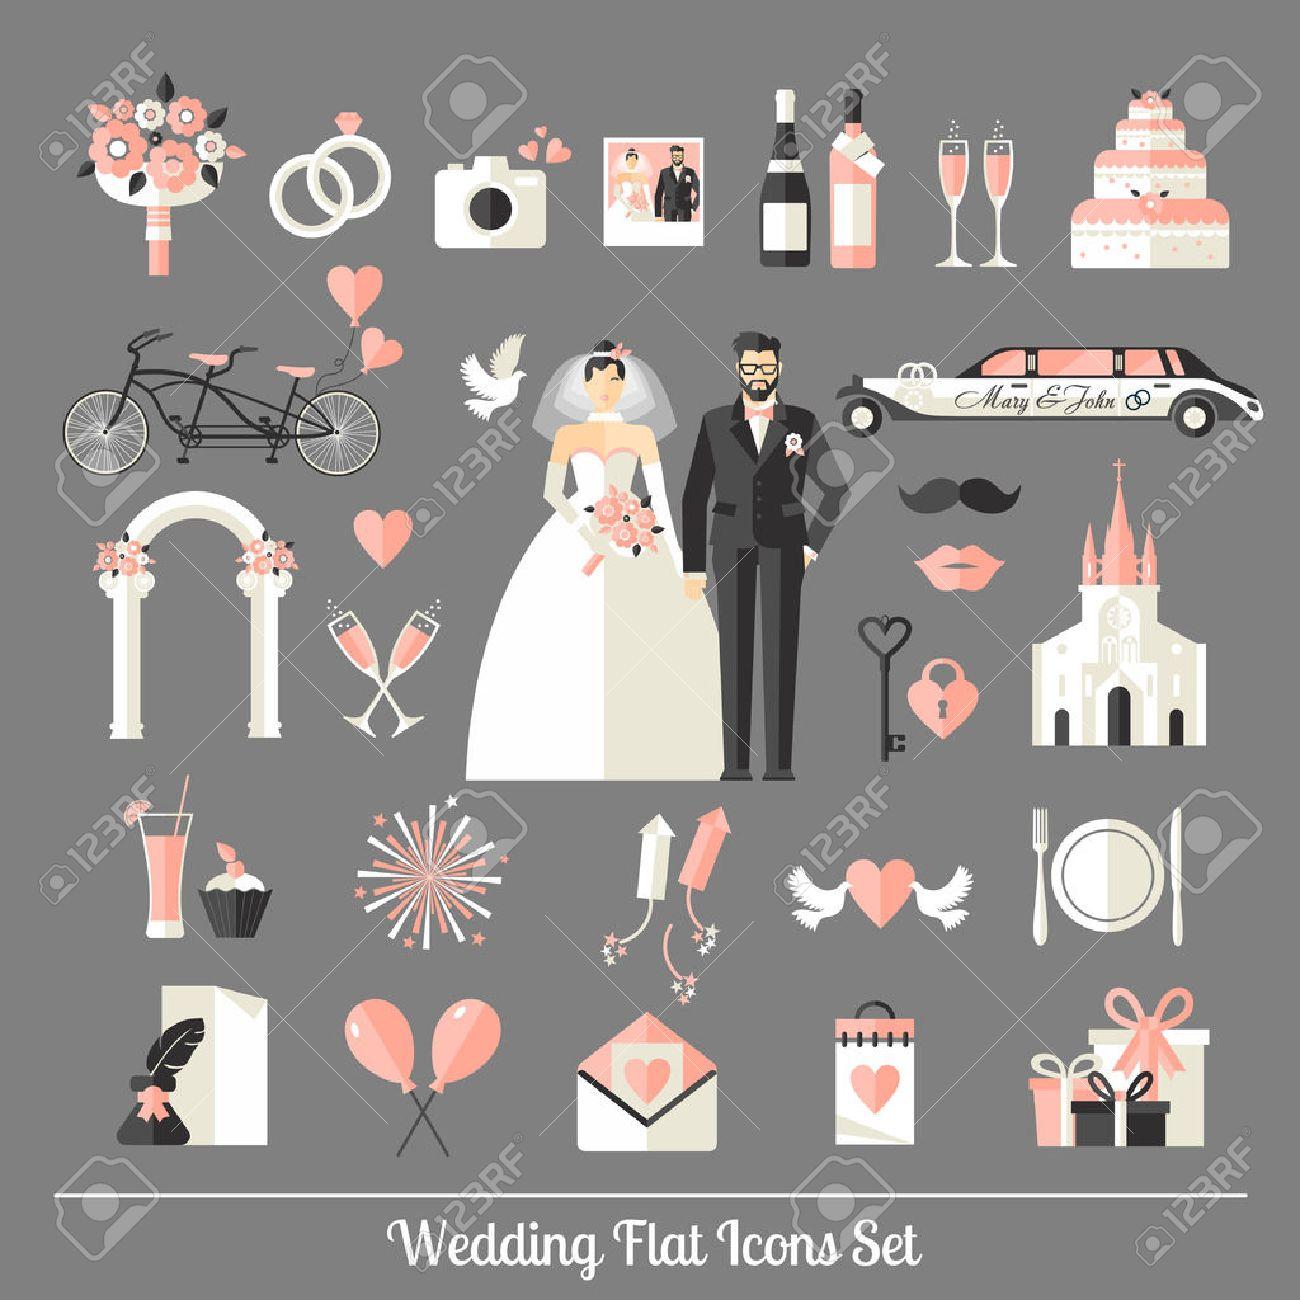 Wedding symbols set. Flat icons for your wedding design. - 43668505